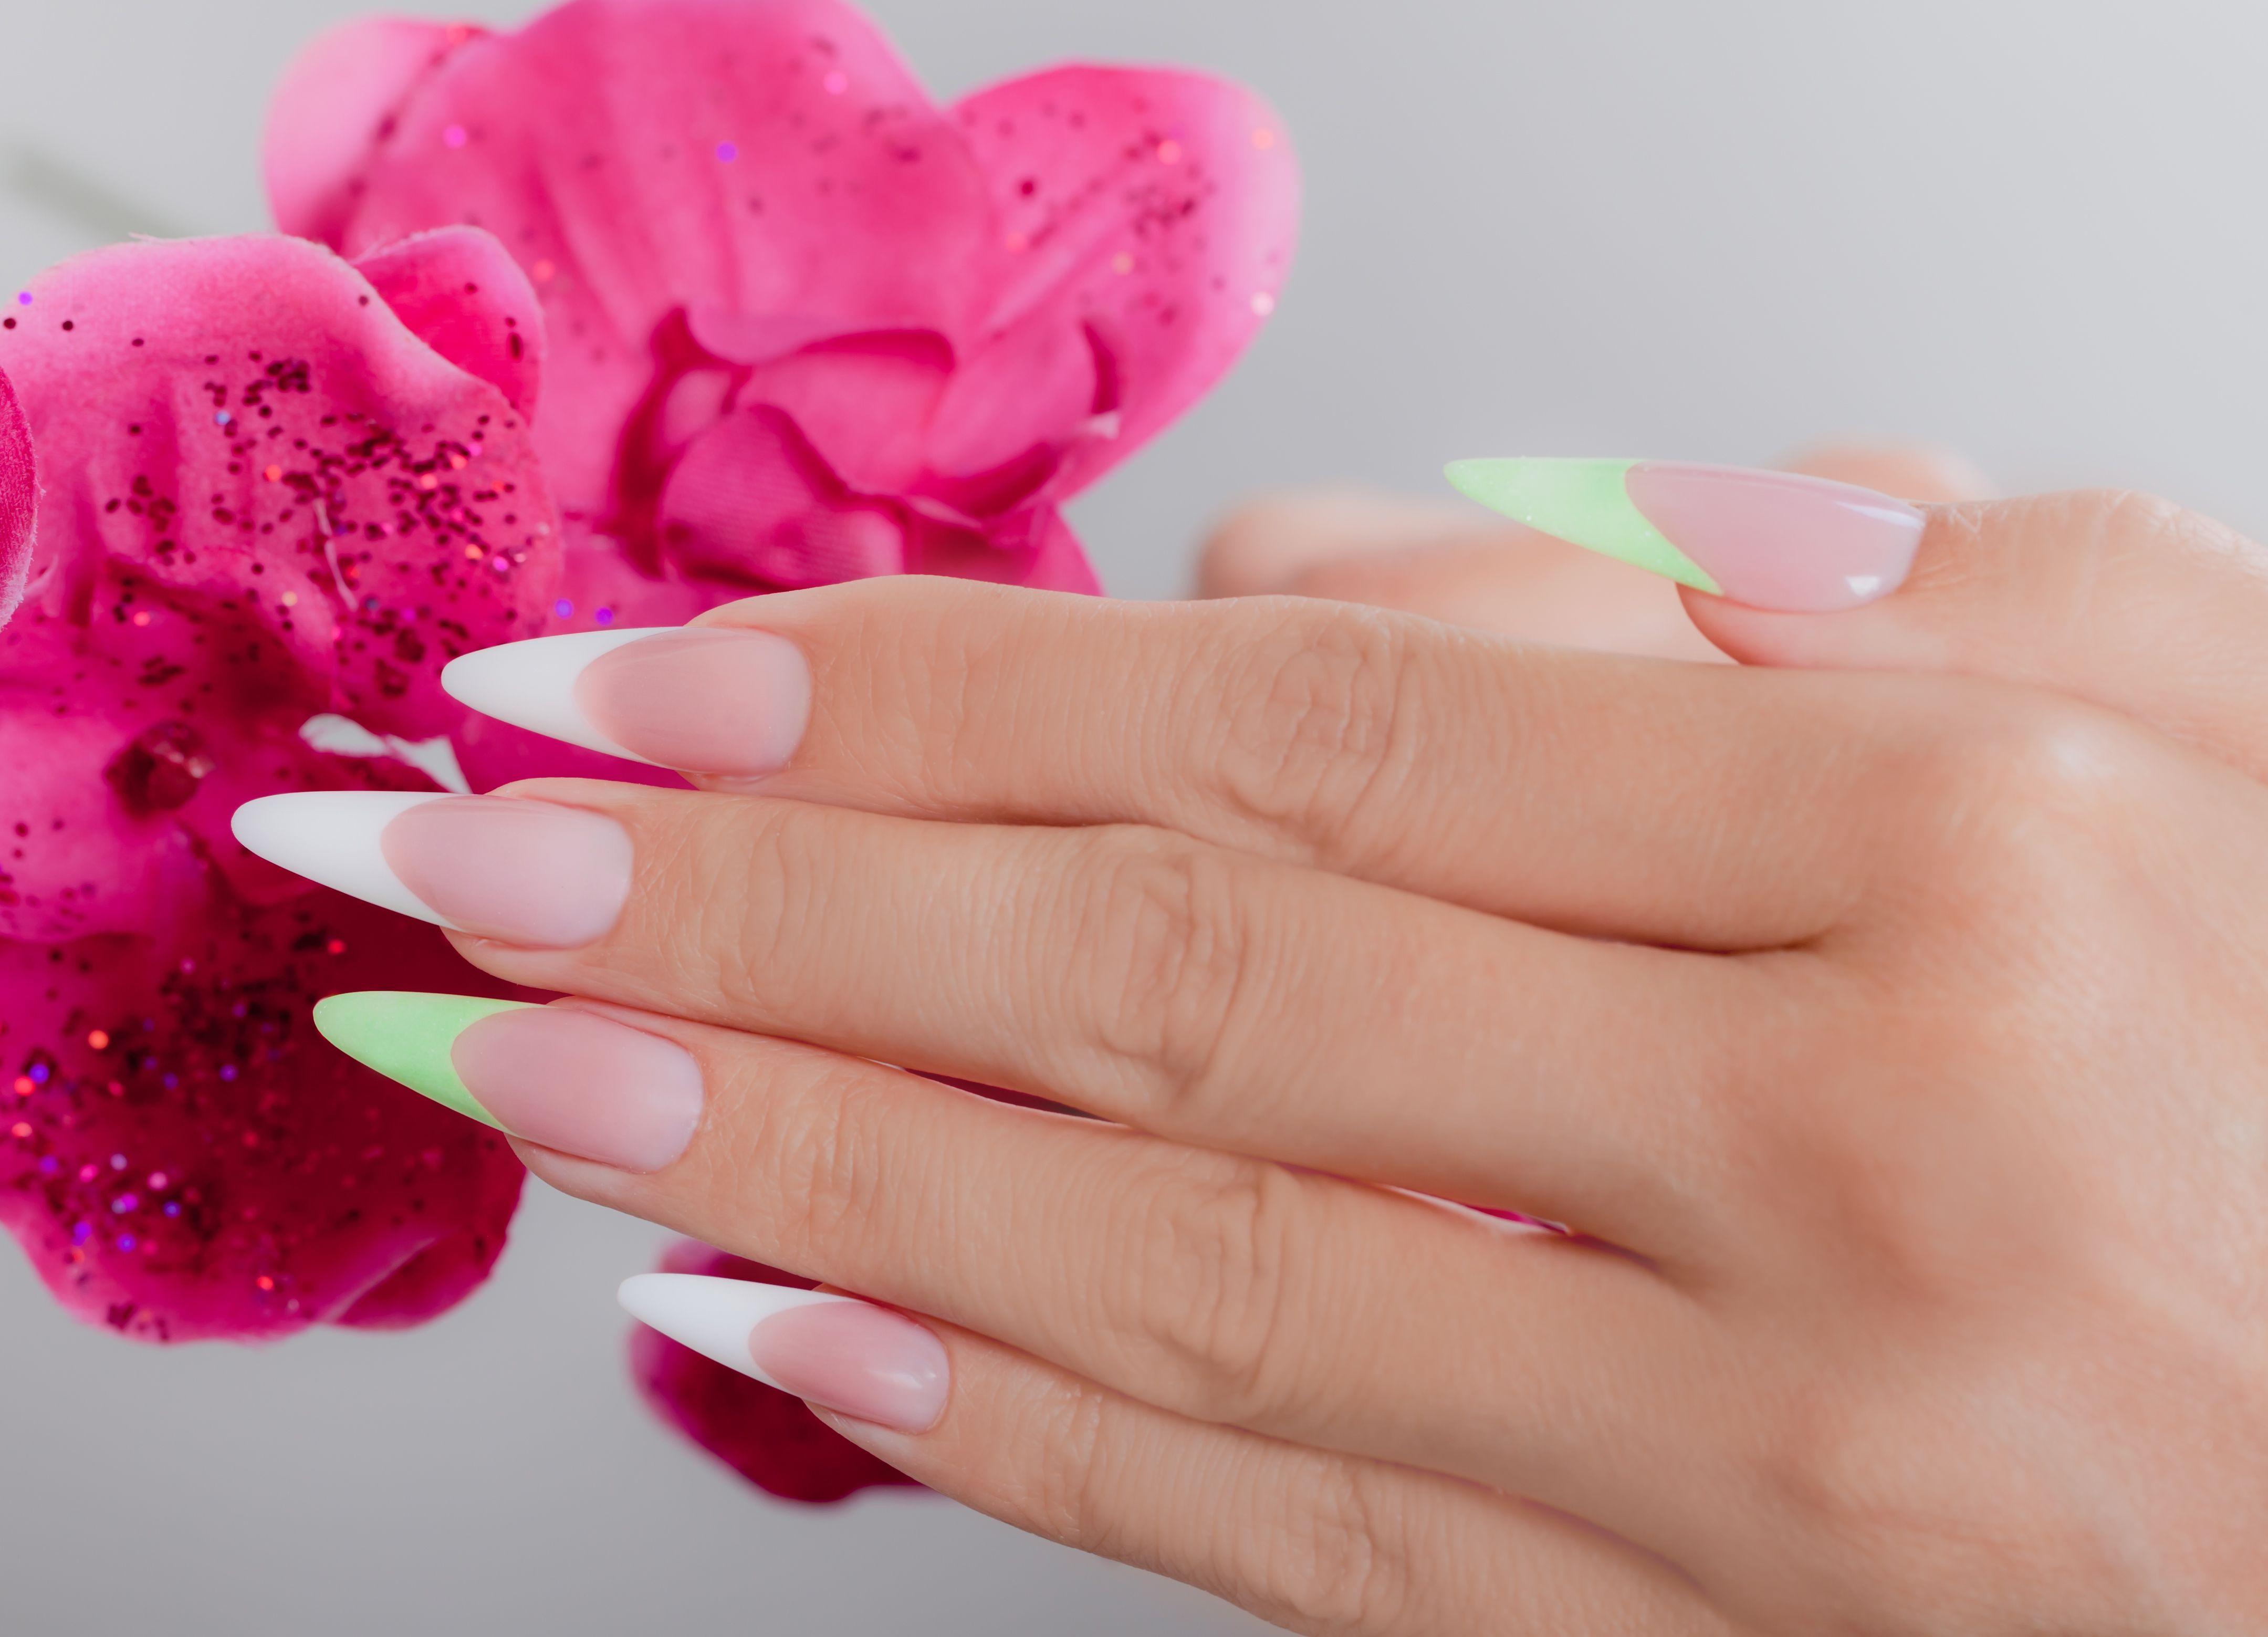 Classic almond nails | Nails | Pinterest | Almond nails ...